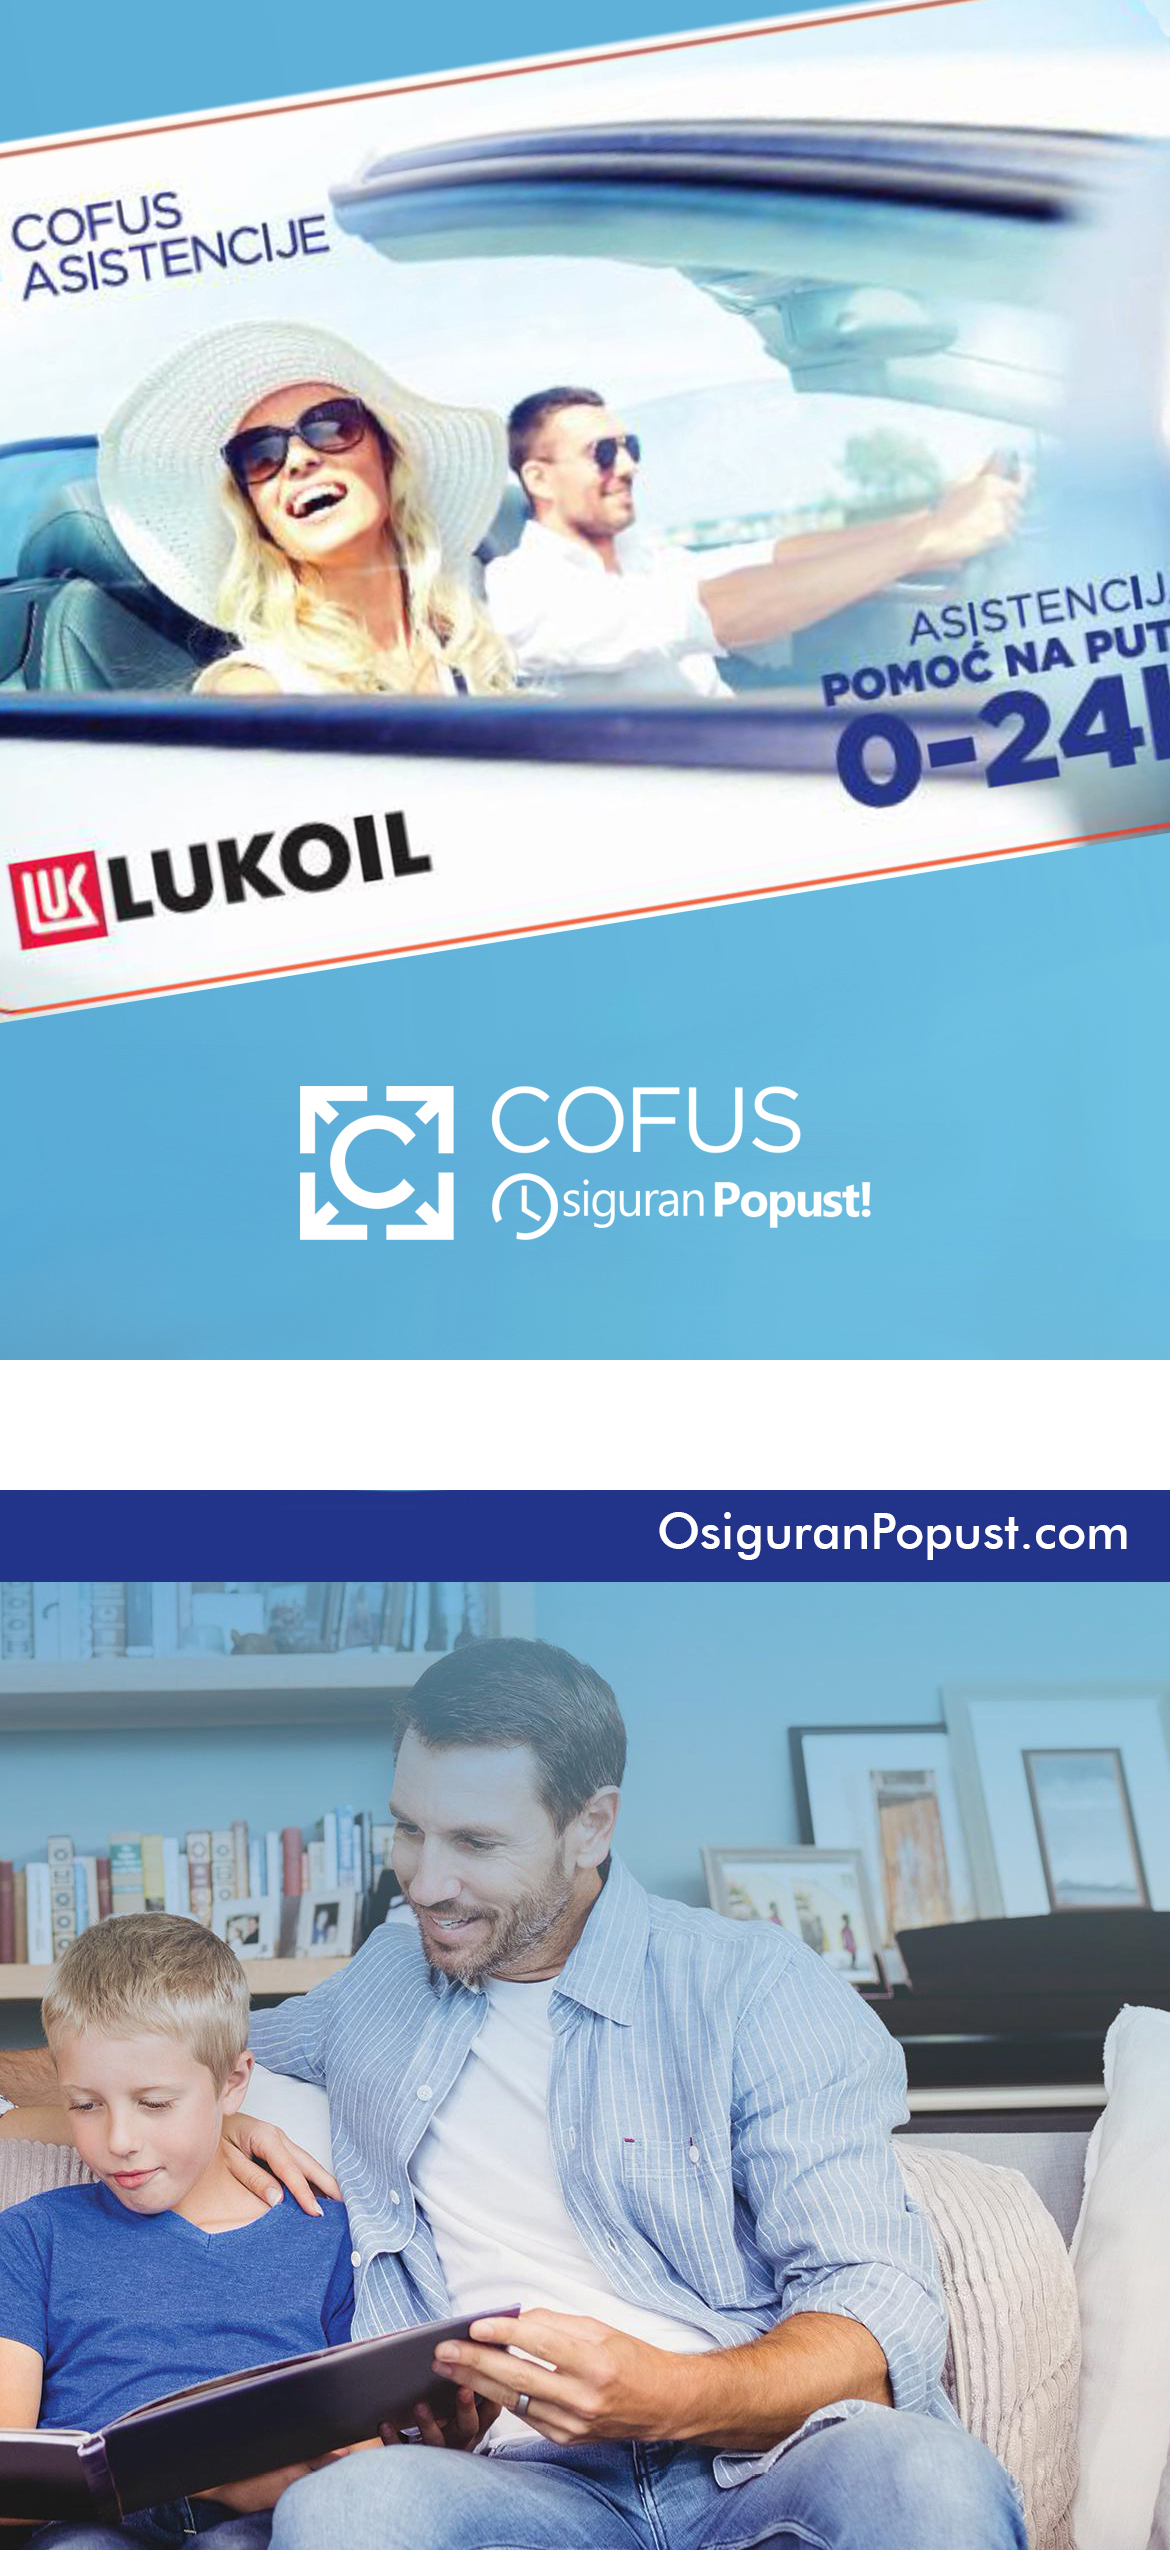 brosura-cofus-osiguran-popust-kartica